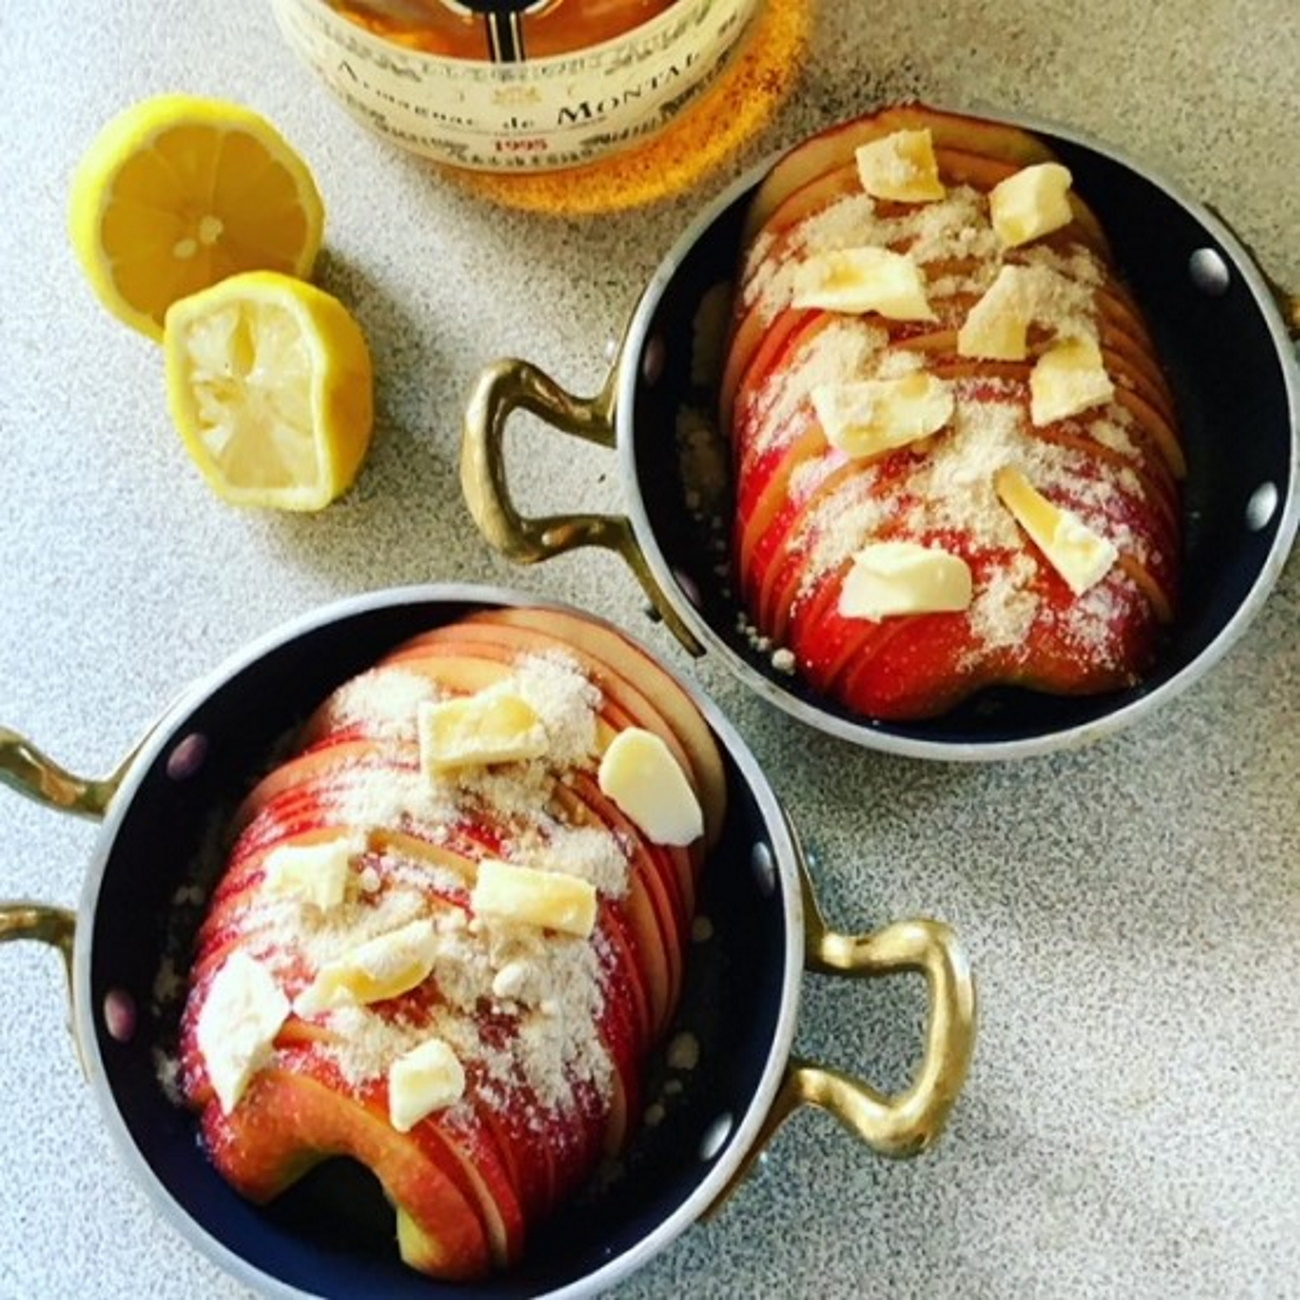 ariko アリコ キッチンツール arikoの食卓 キッチンツール サービングパン バッラリー二 BALLARINI ベイクドアップルスライス バニラアイス アップル レモン 洋酒 きび糖